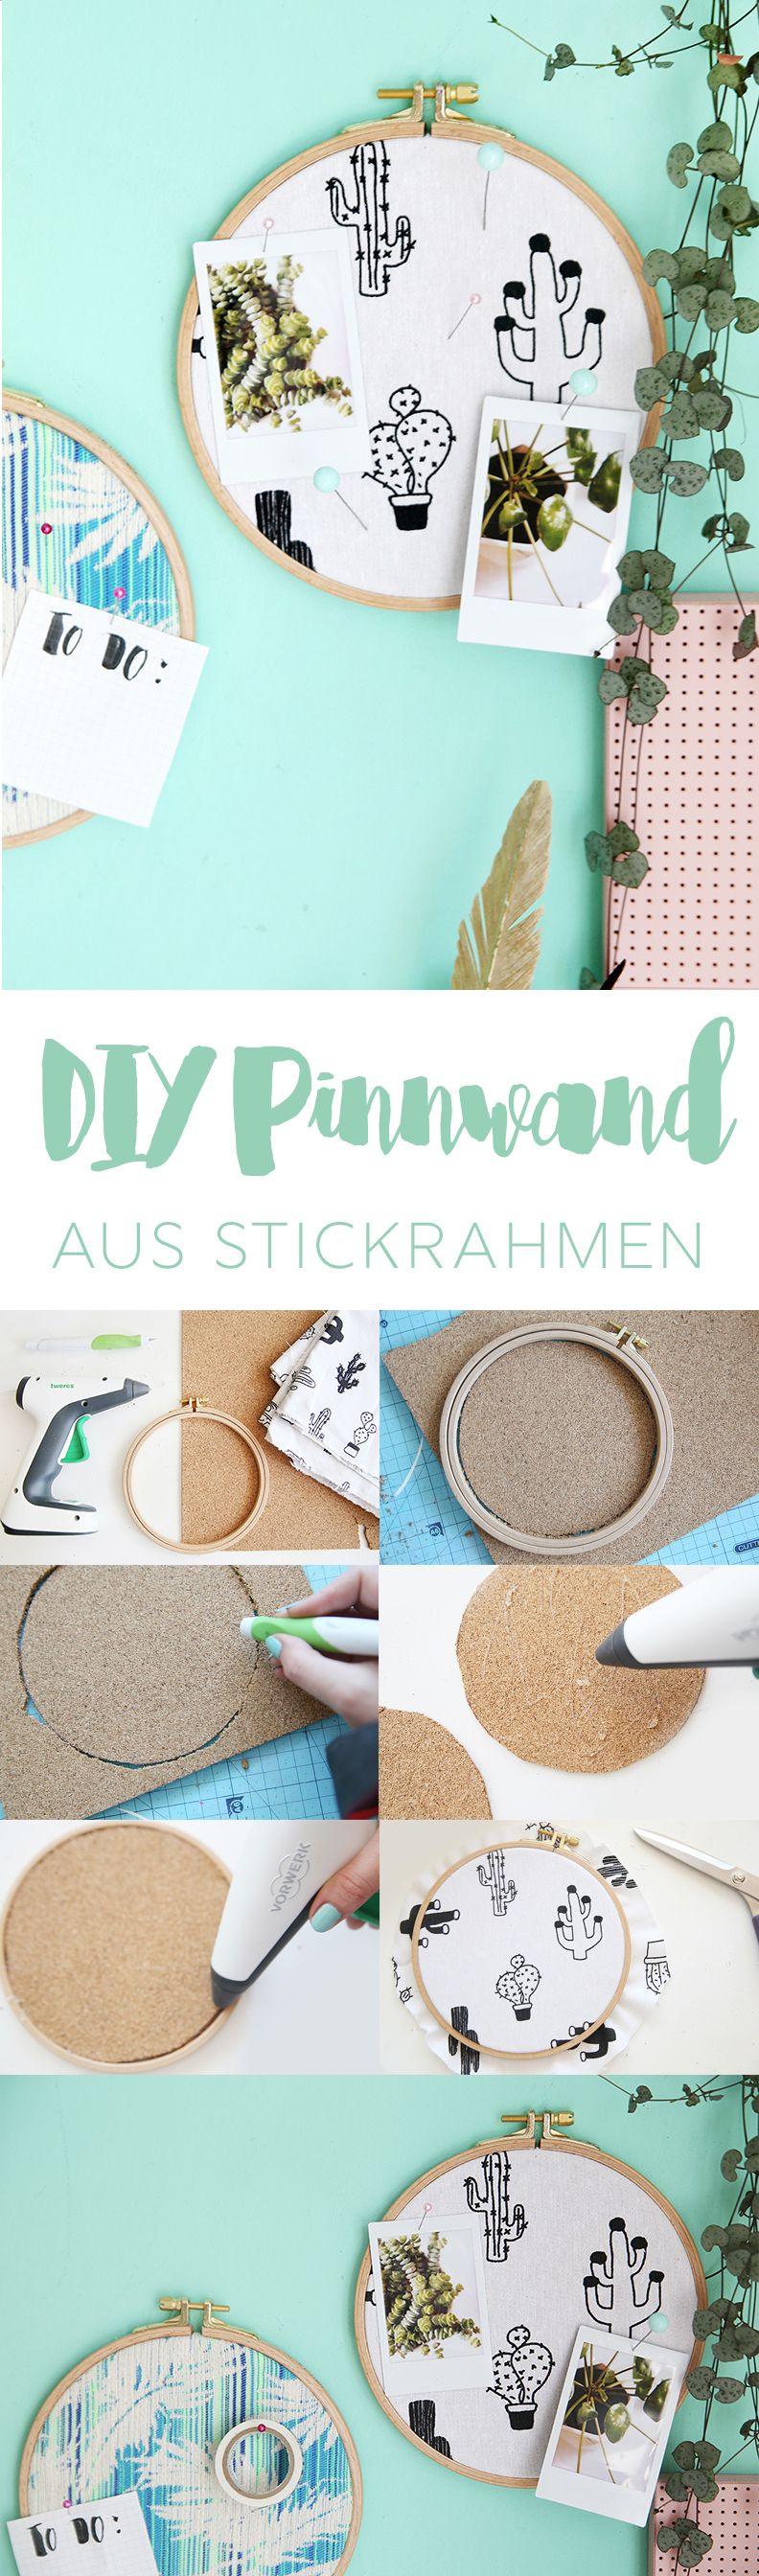 diy challenge stoff kork stoff pinnwand aus stickrahmen diy inspirationen pinterest. Black Bedroom Furniture Sets. Home Design Ideas